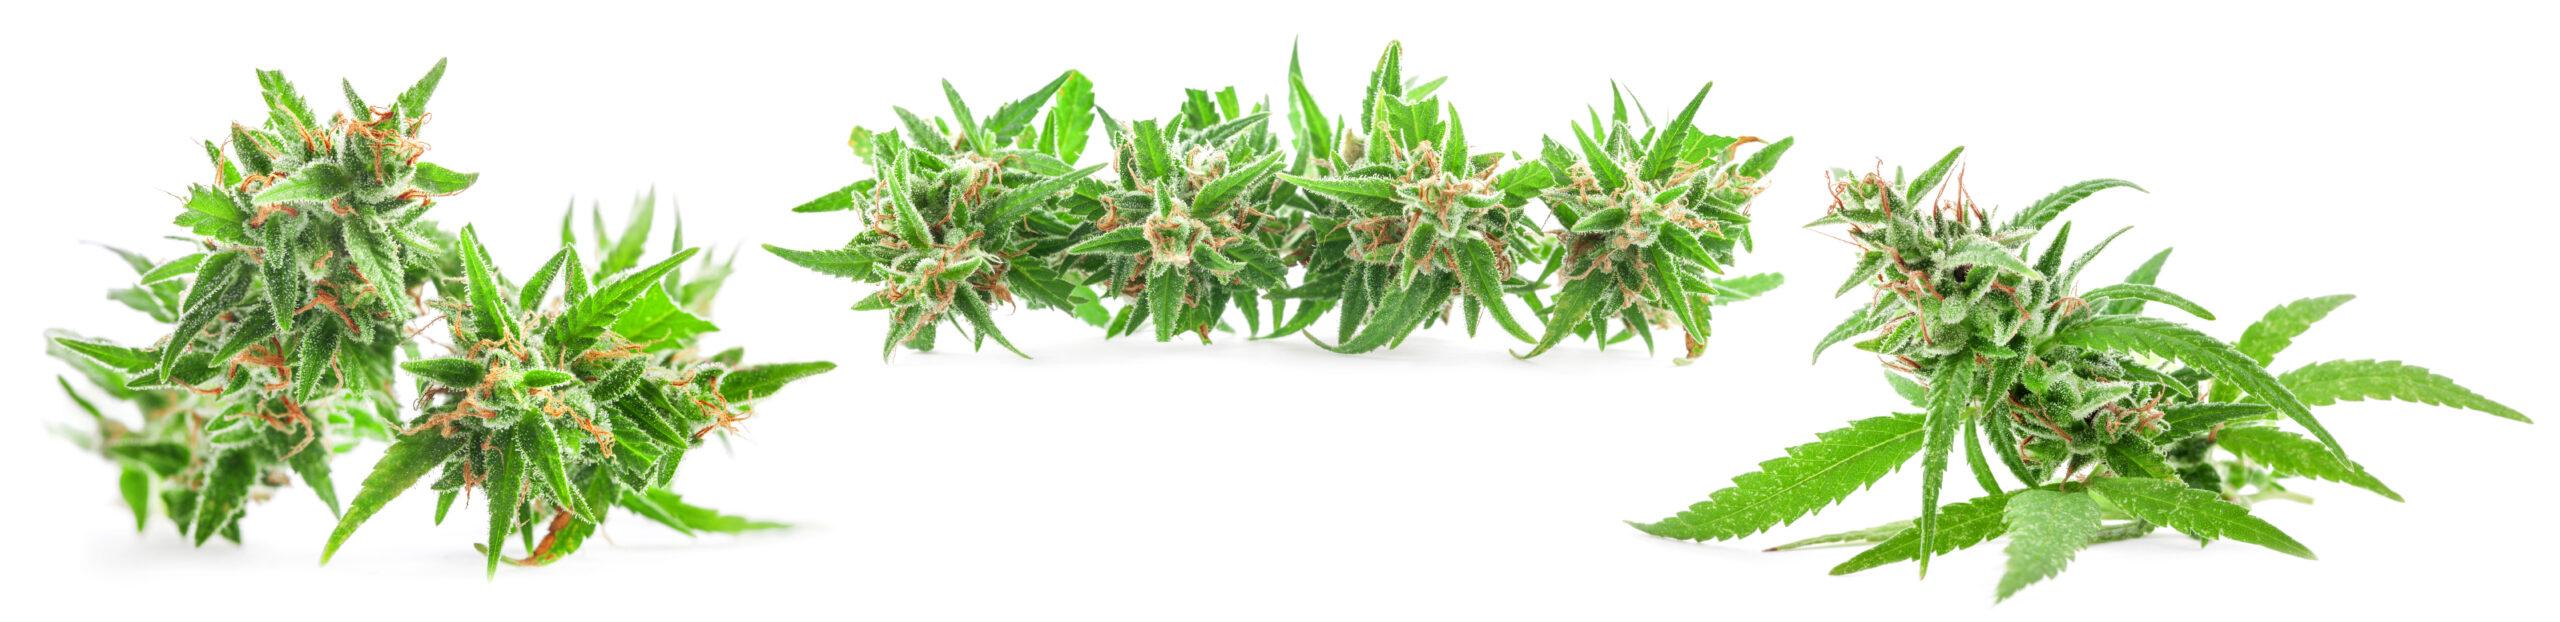 Fresh Medical marijuana isolated on white background. Therapeutic and Medical cannabis